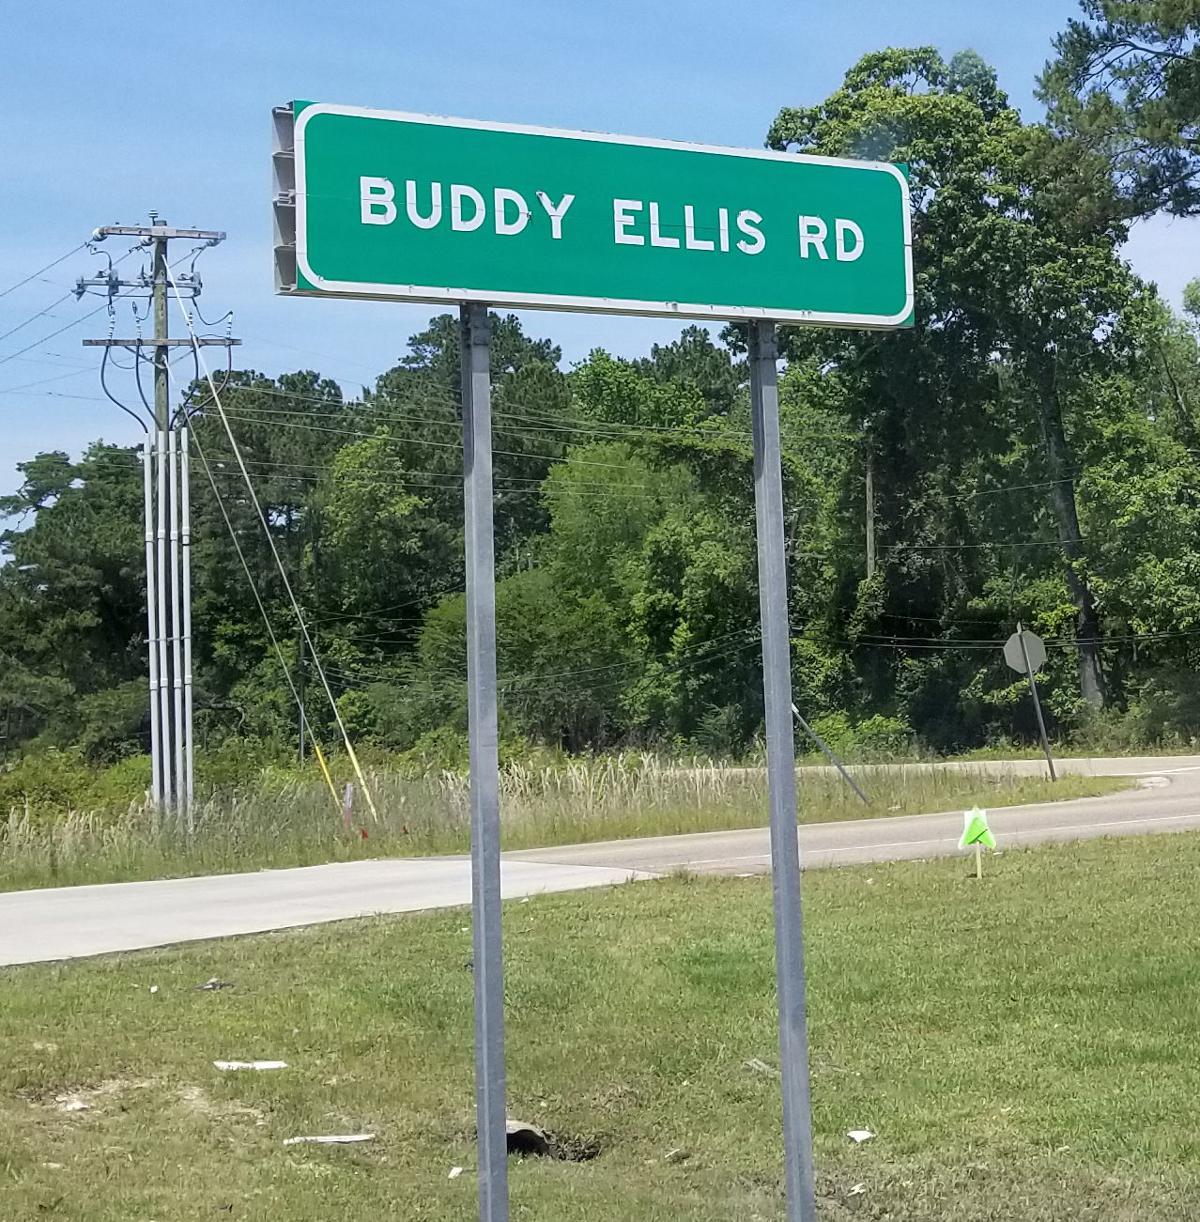 Buddy Ellis Road